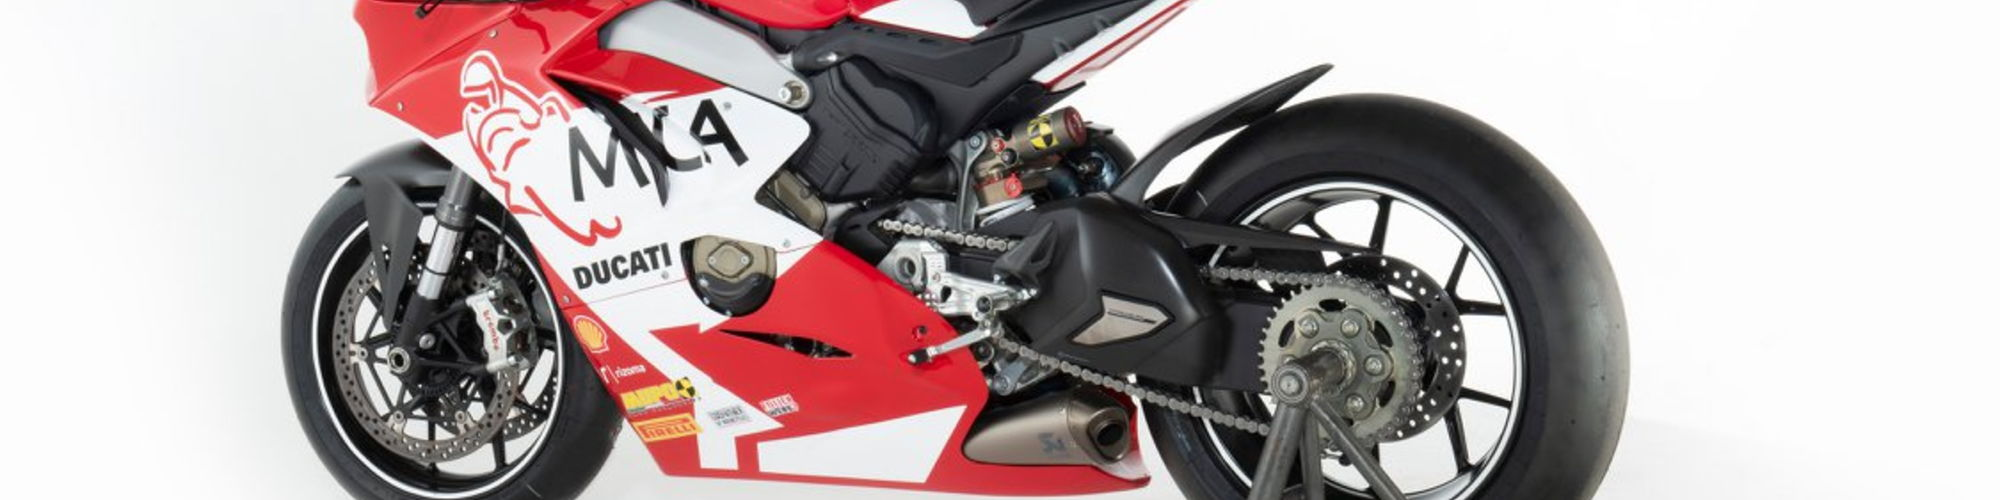 Motorrad Center Altendiez cover image